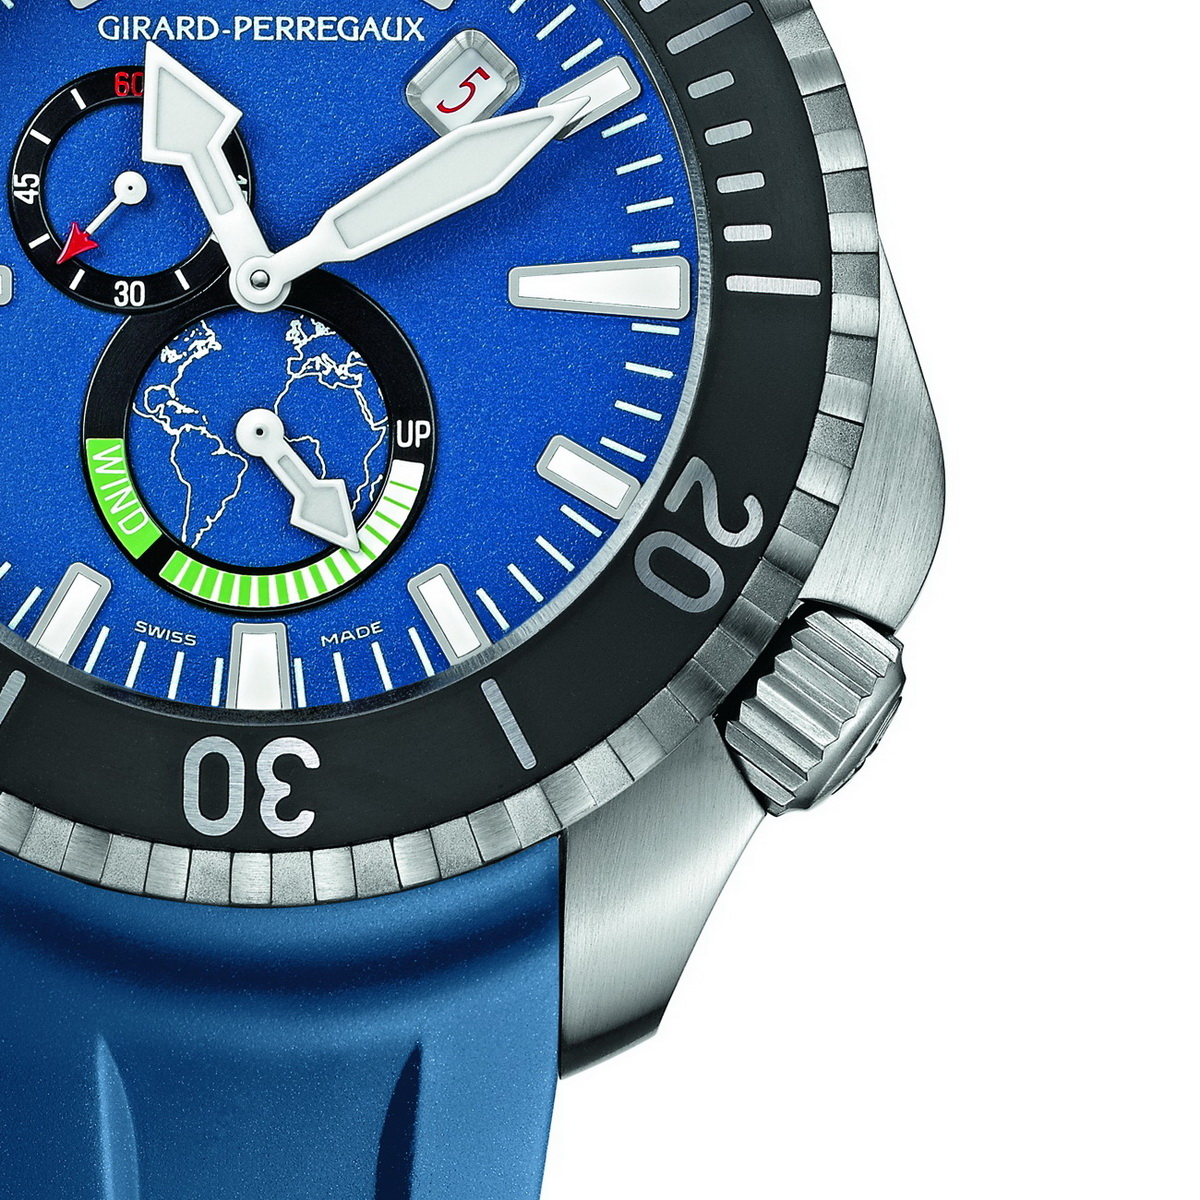 Girard perregaux seahawk 1000 big blue for Girard perregaux